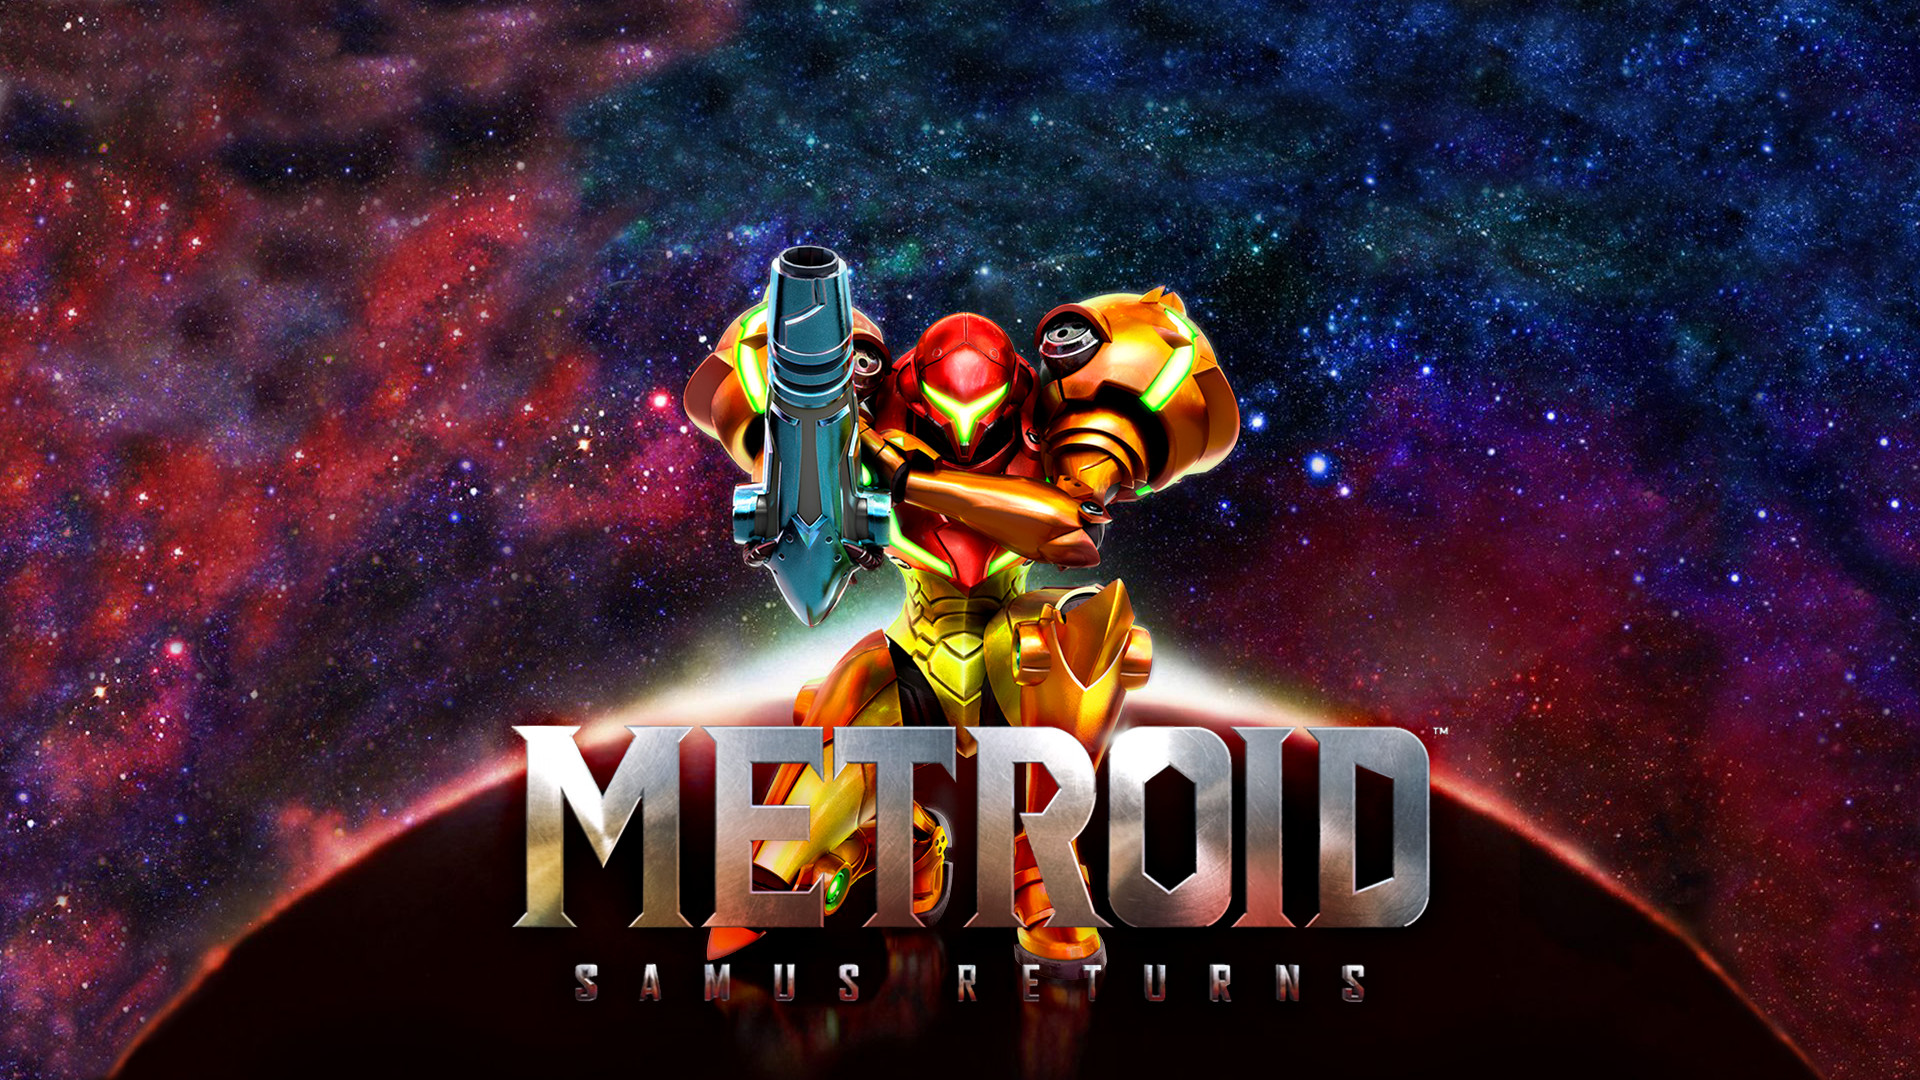 Metroid Phone Wallpaper (65+ Images